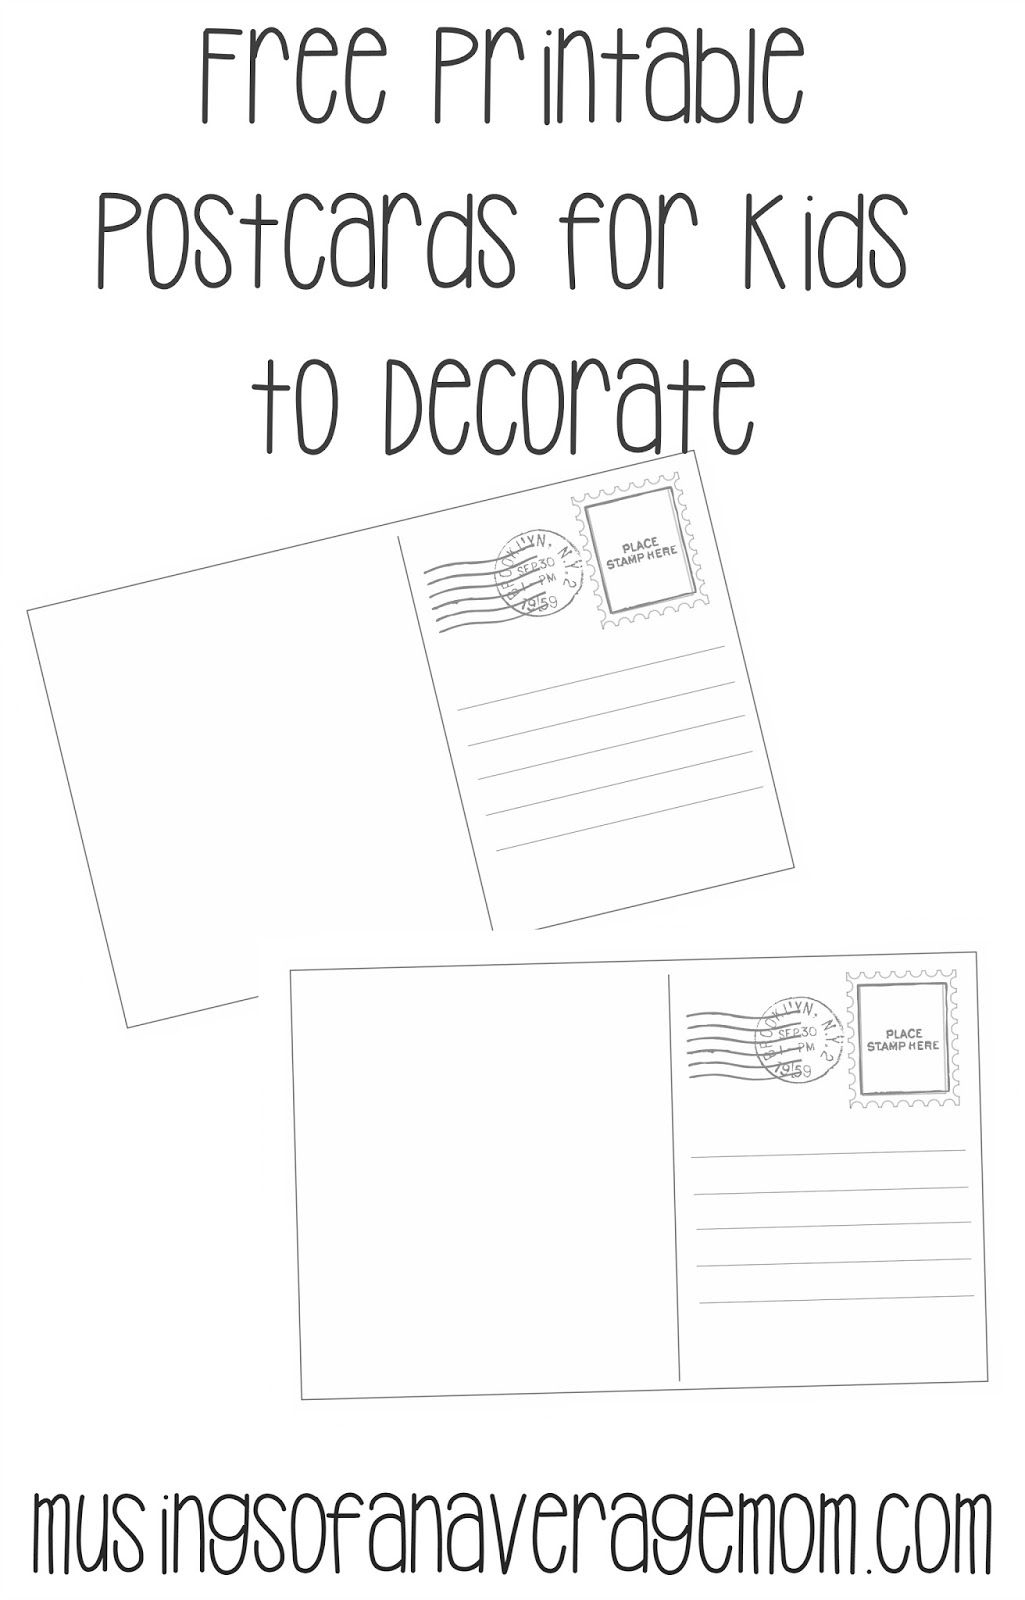 Postcard Templates | Printable Worksheets | Pinterest | Free - Free Printable Postcard Template